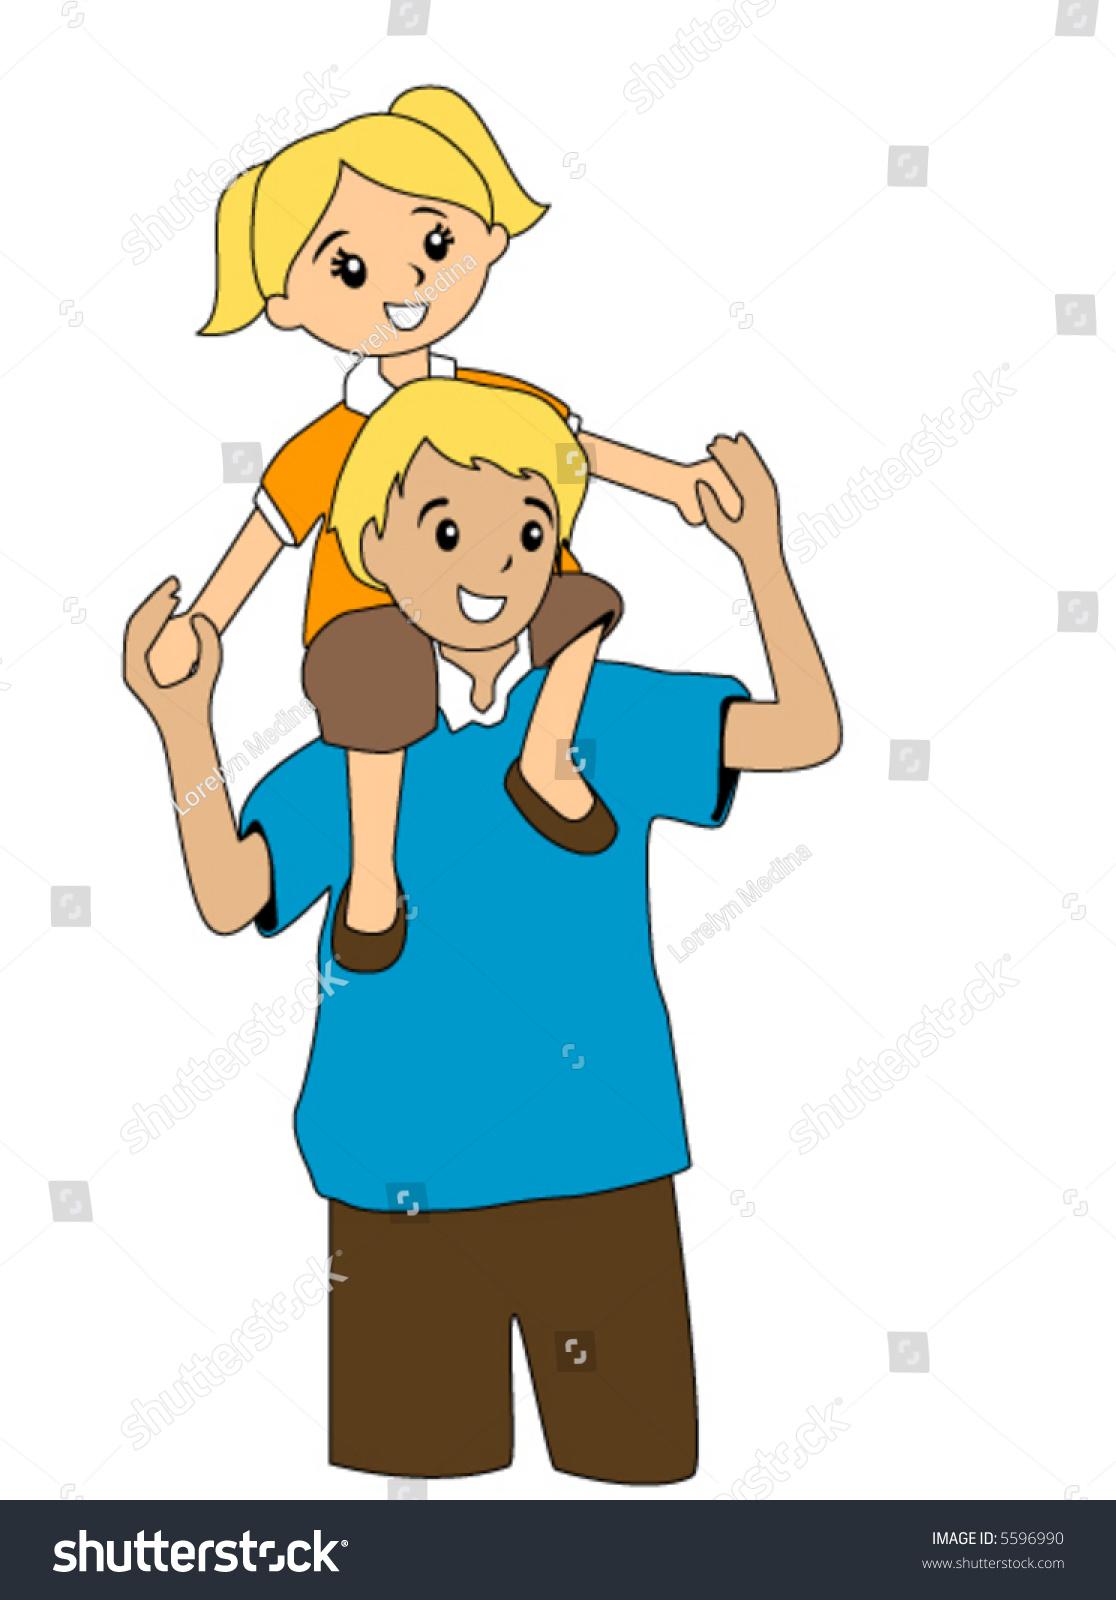 kids hugging clipart